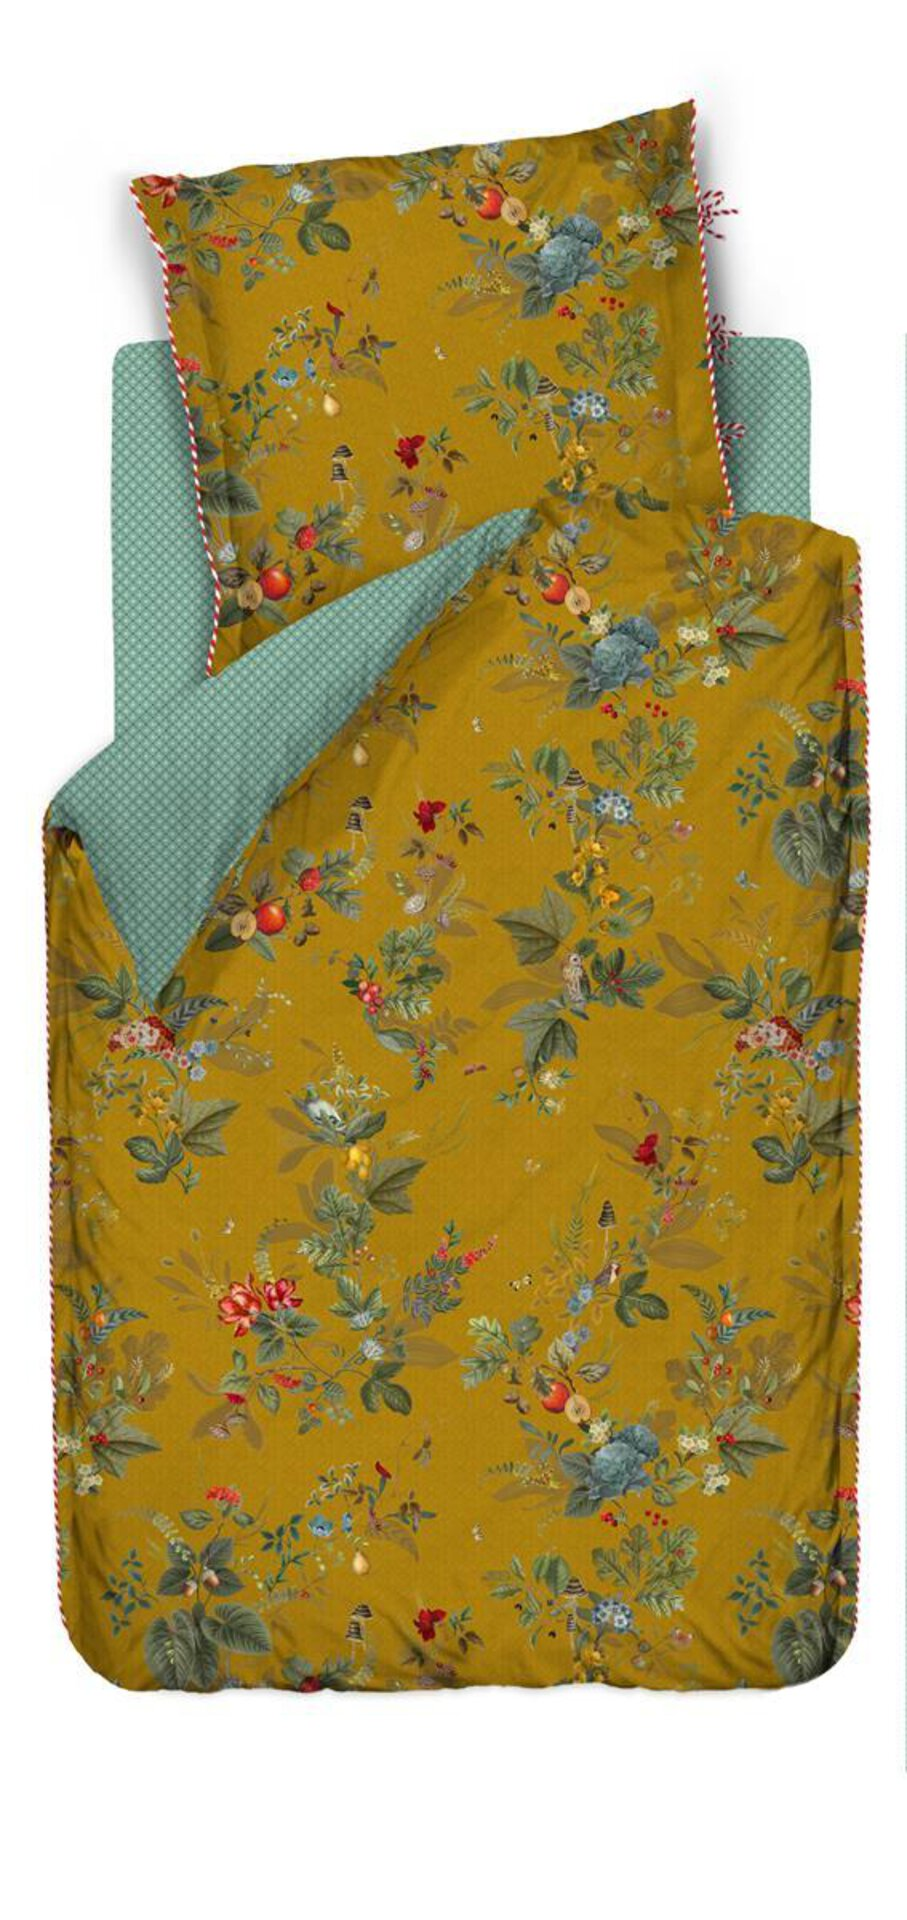 Bettwäsche Fallin Leaf PIP STUDIO Textil gelb 135 x 200 cm